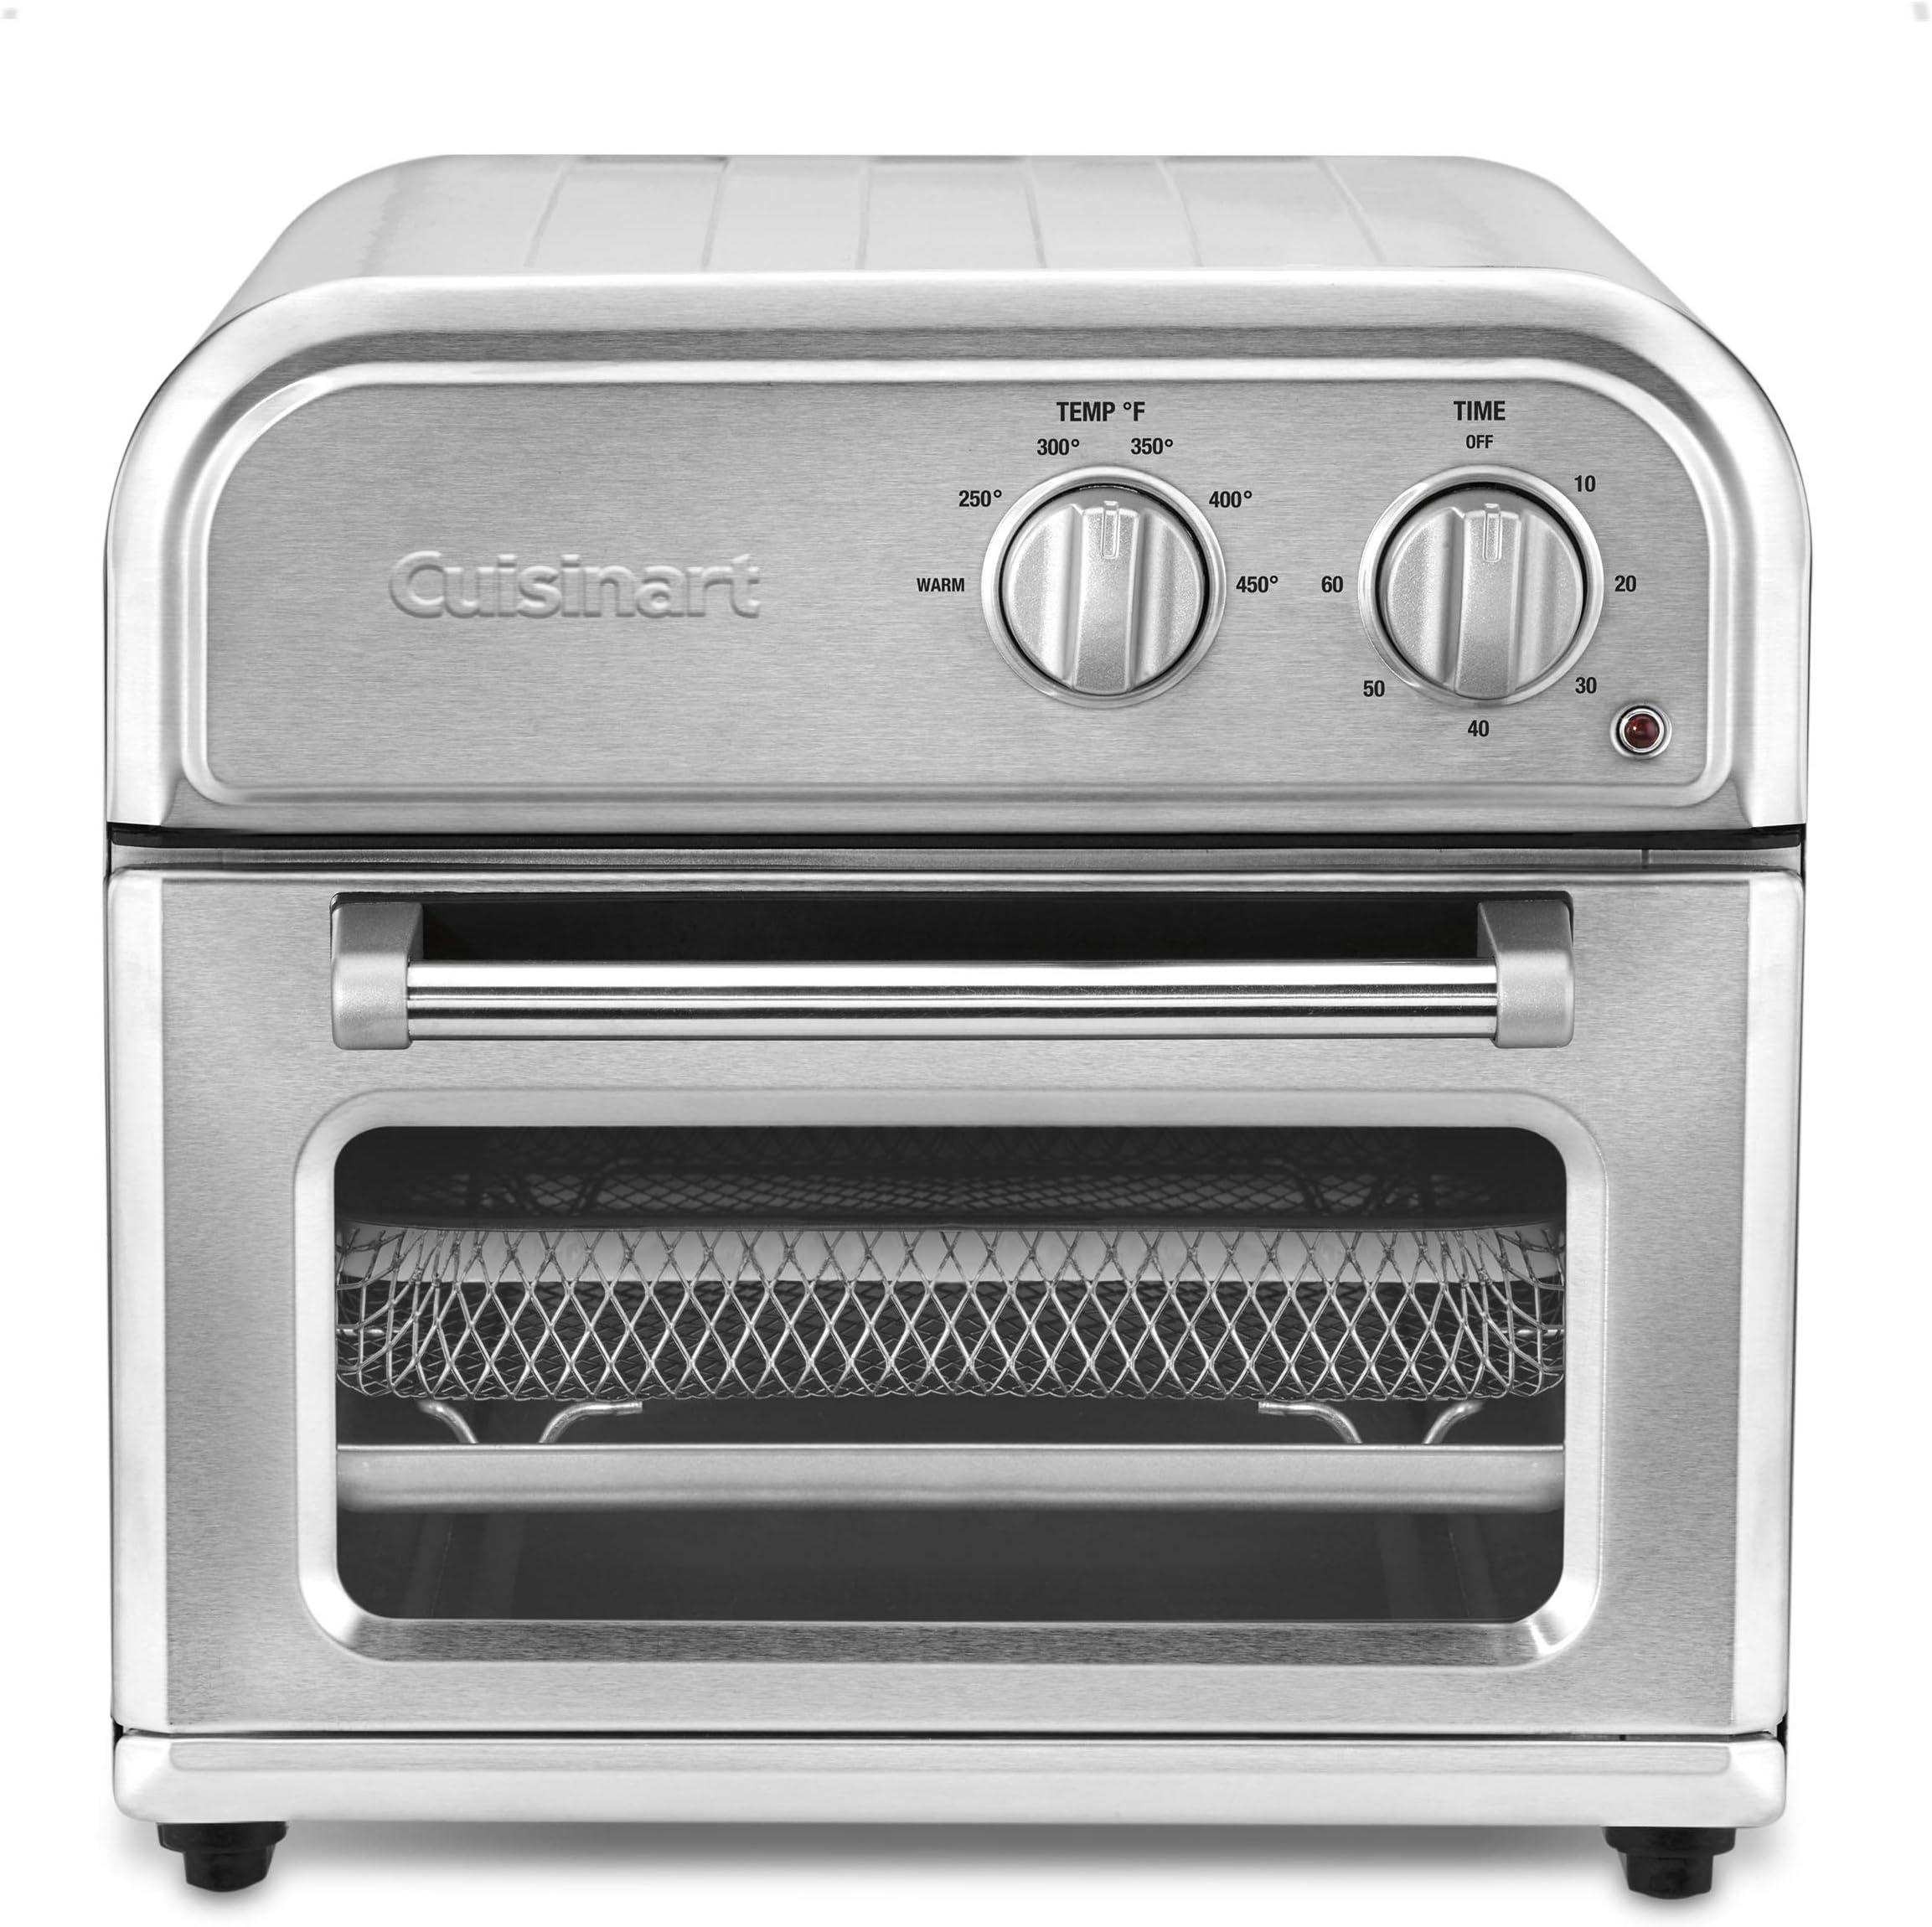 Cuisinart AFR-25, Airfryer, Silver